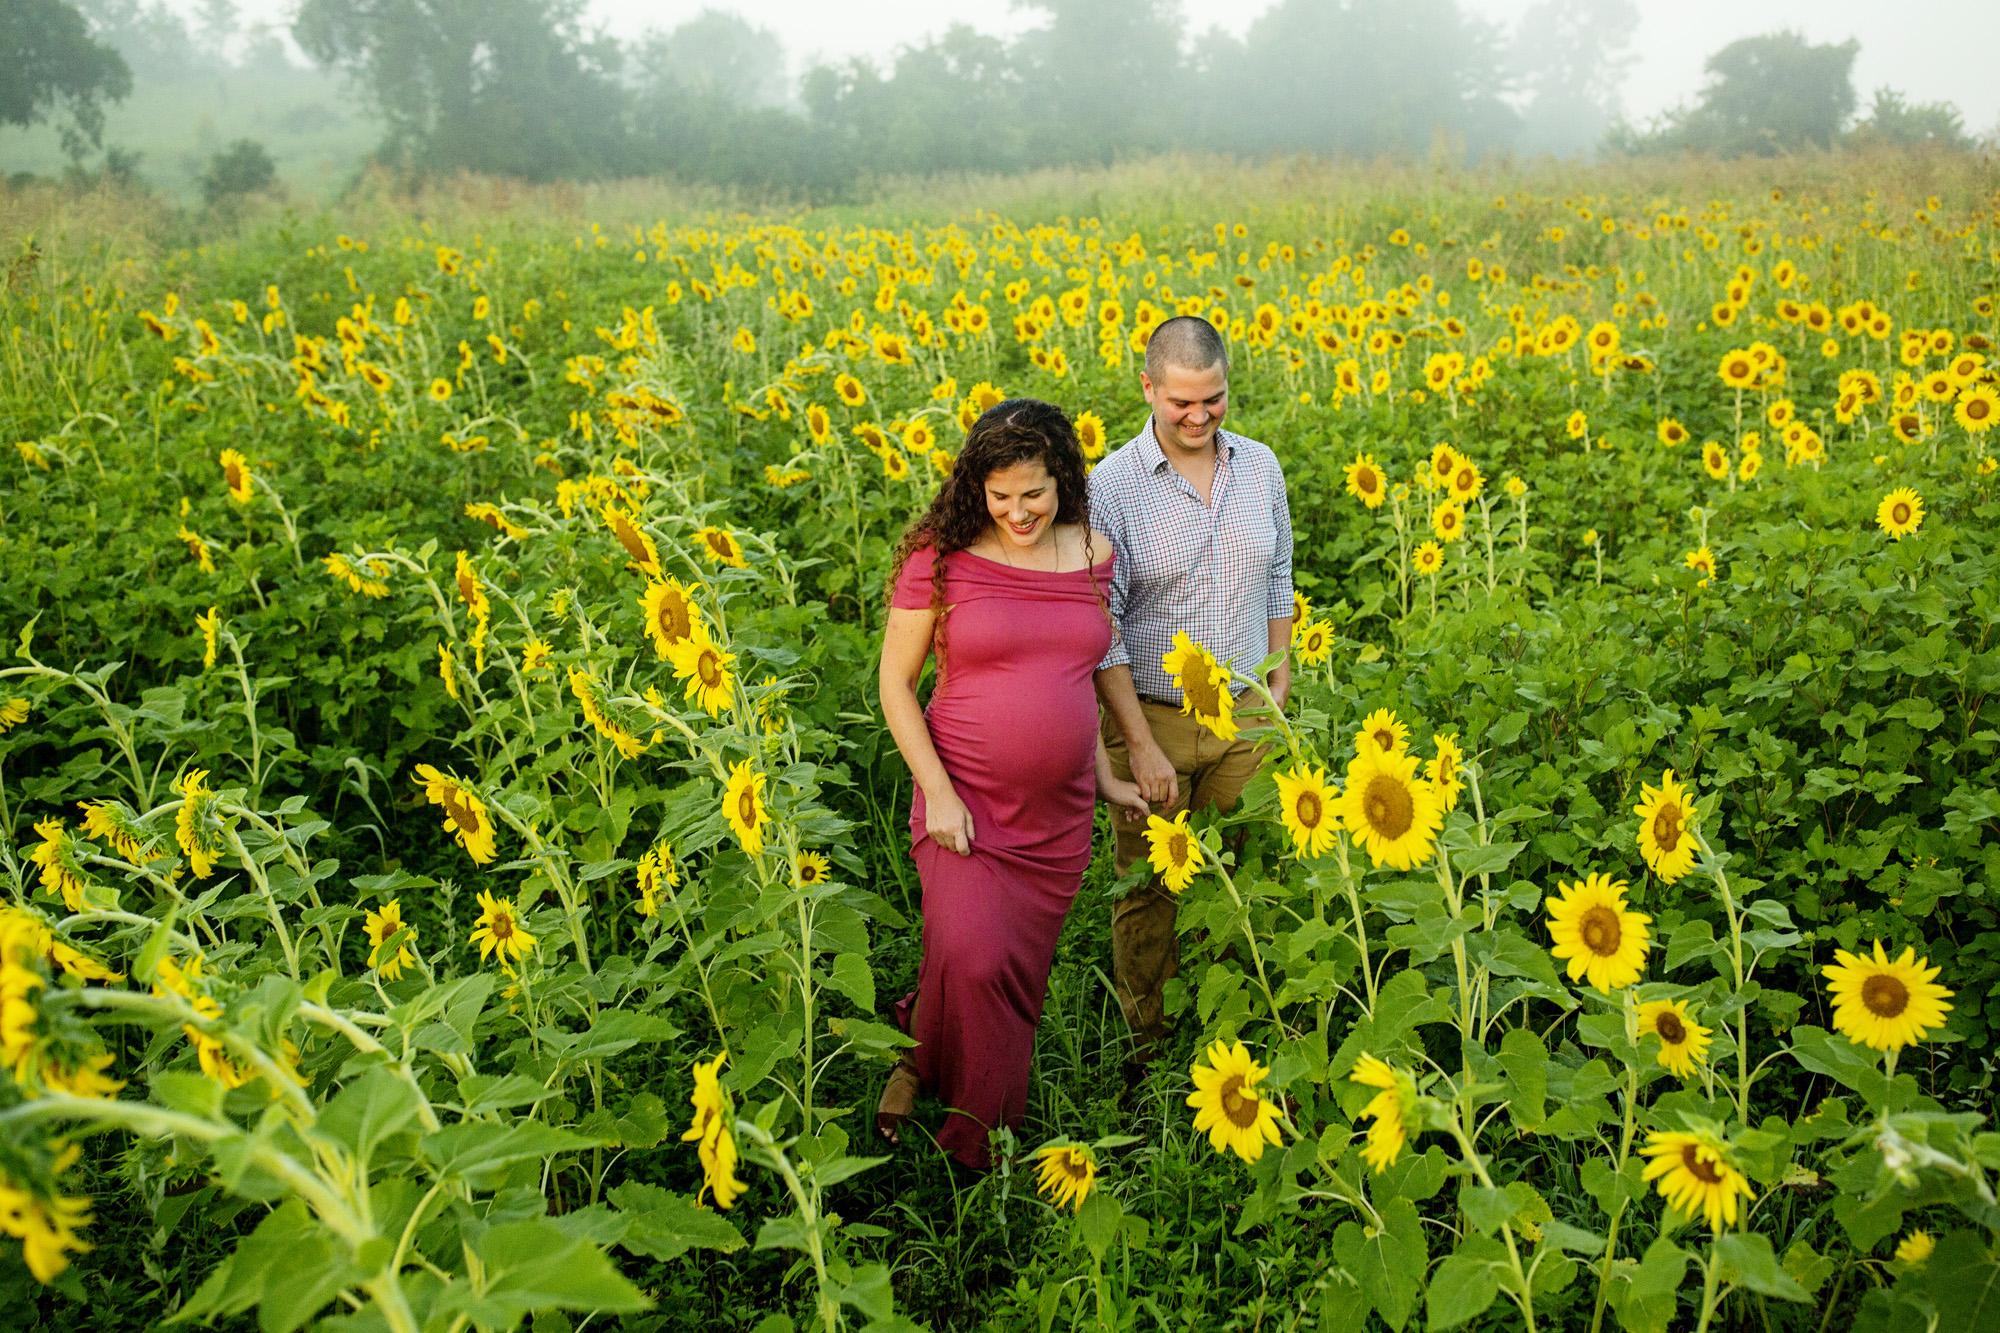 Seriously_Sabrina_Photography_Lexington_Frankfort_Kentucky_Maternity_Mini_Sunflowers_Johns15.jpg